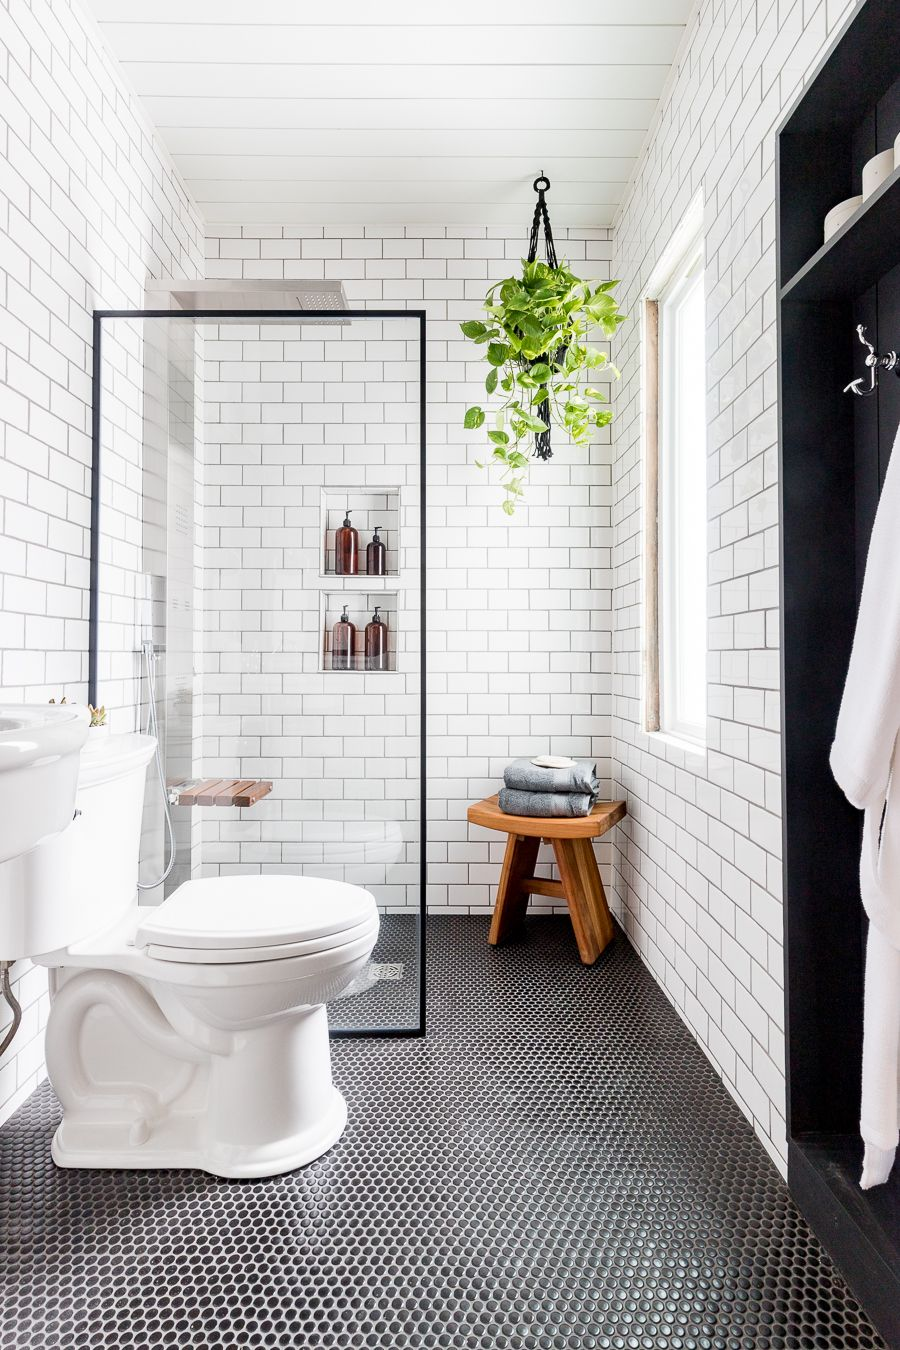 Black And White Industrial Bathroom Cherished Bliss Small Bathroom Bathroom Transformation Small Bathroom Remodel